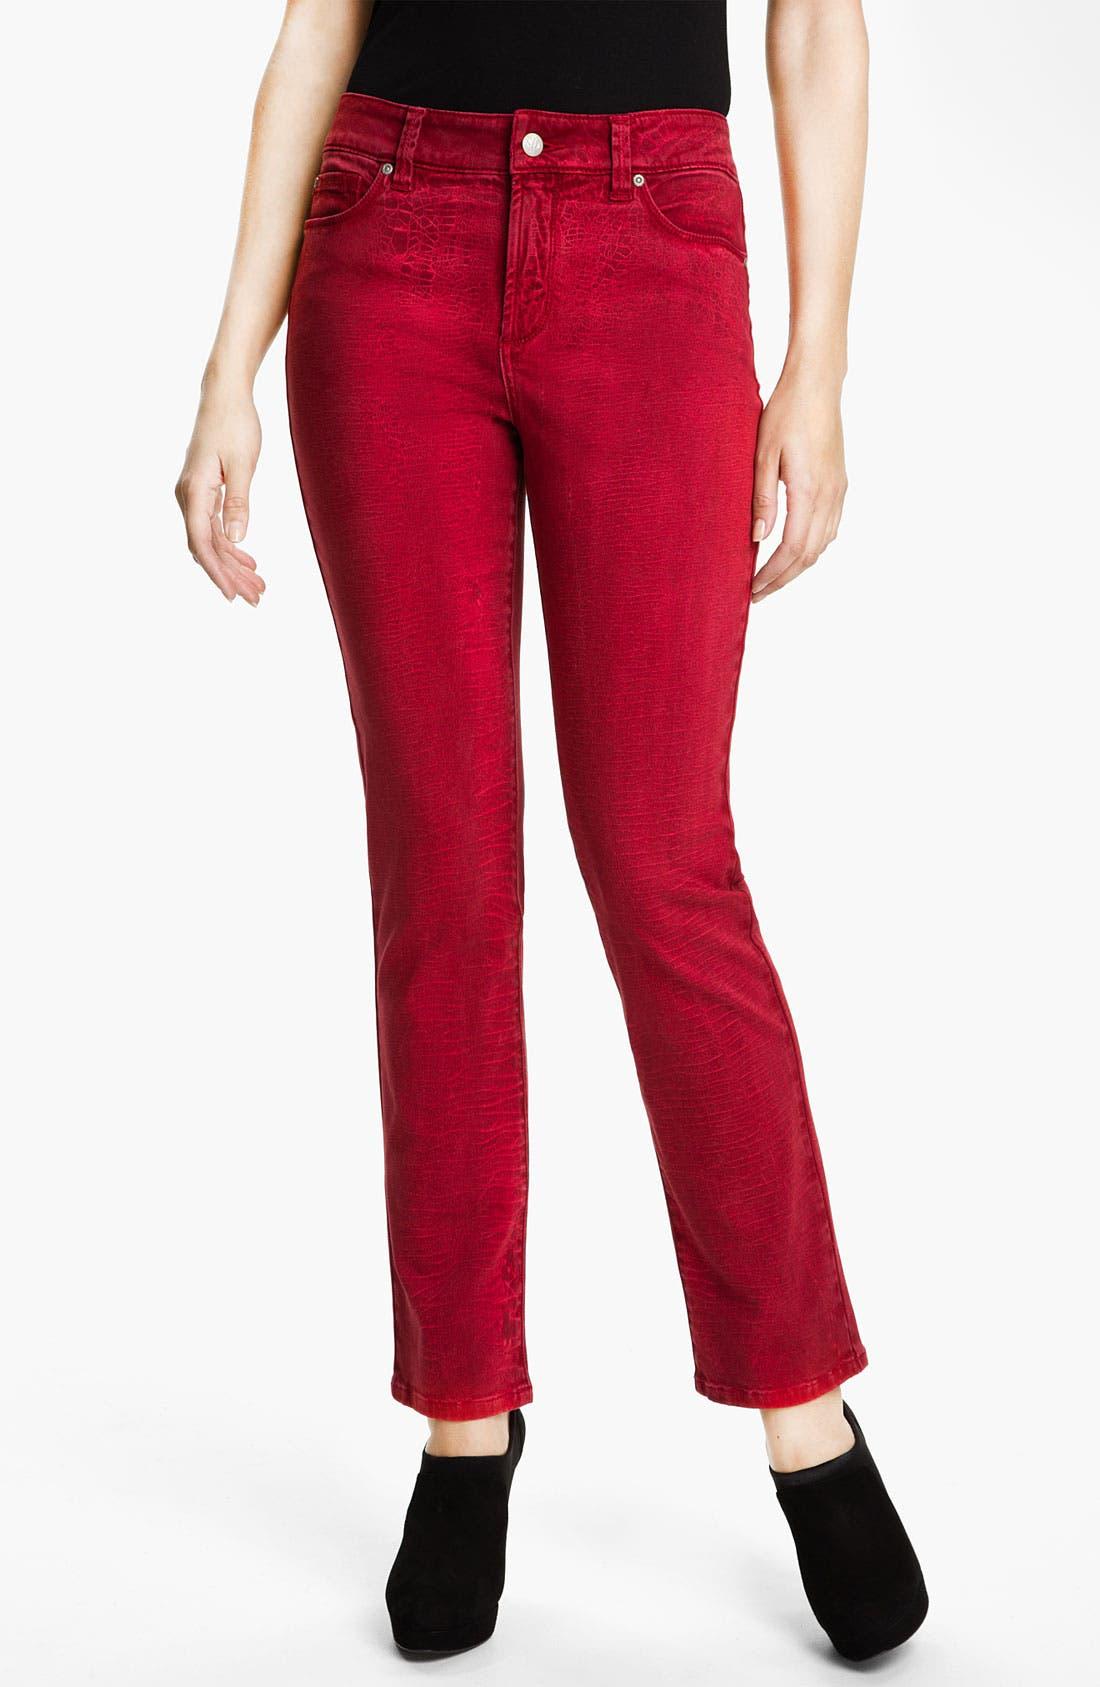 Alternate Image 1 Selected - NYDJ 'Sheri - Shattered' Print Skinny Twill Jeans (Petite)